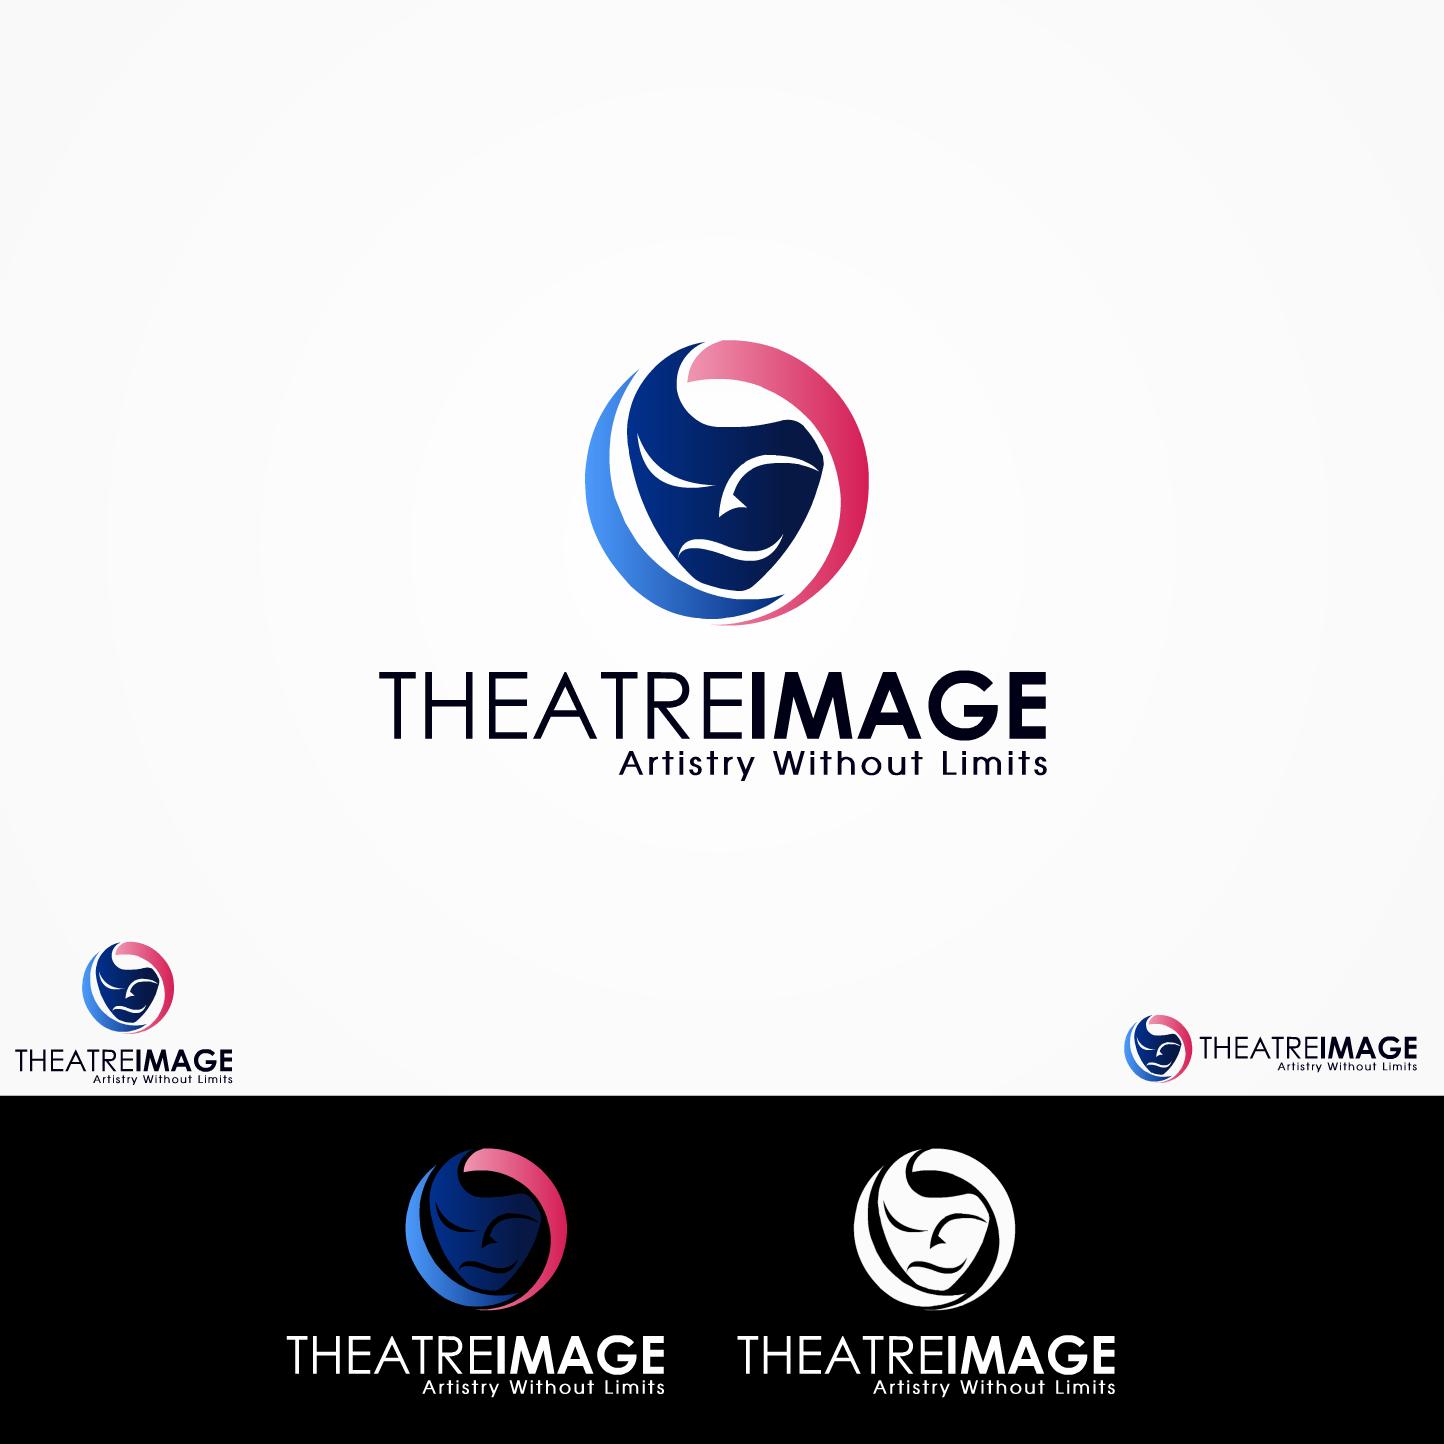 Theatre Image needs a new logo